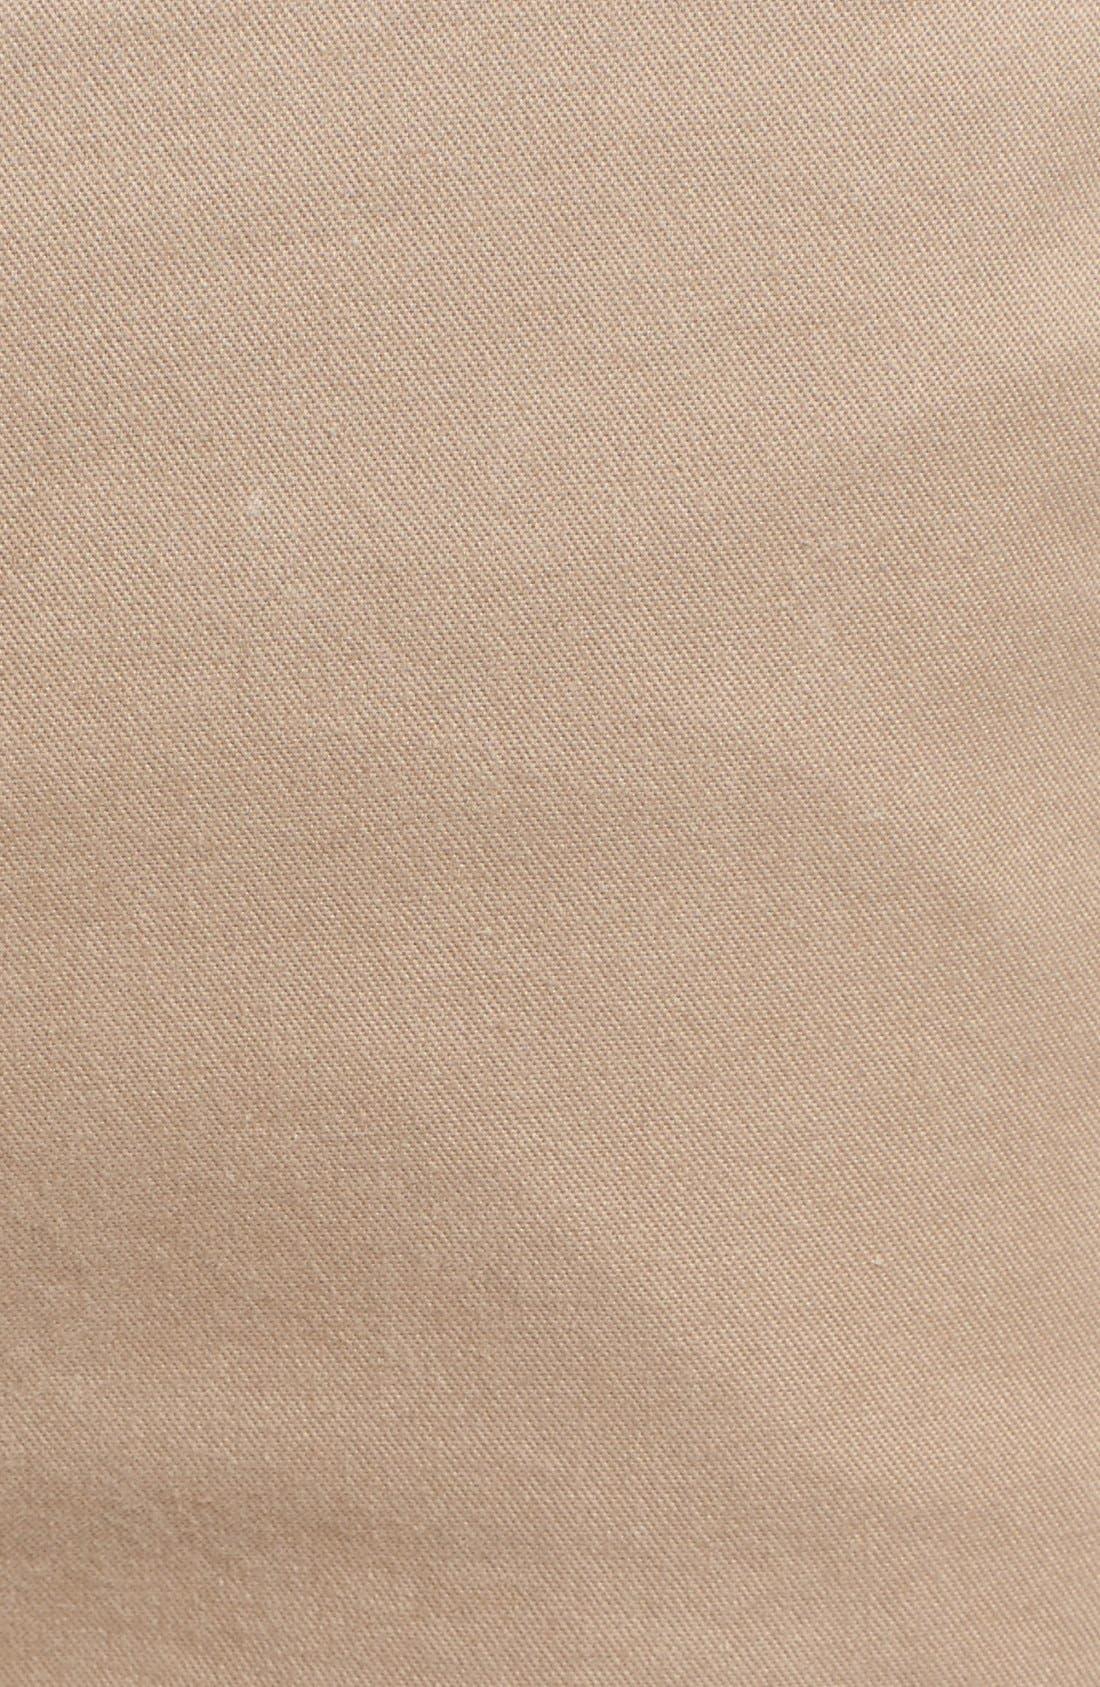 Salerno Stretch Woven Jogger Pants,                             Alternate thumbnail 12, color,